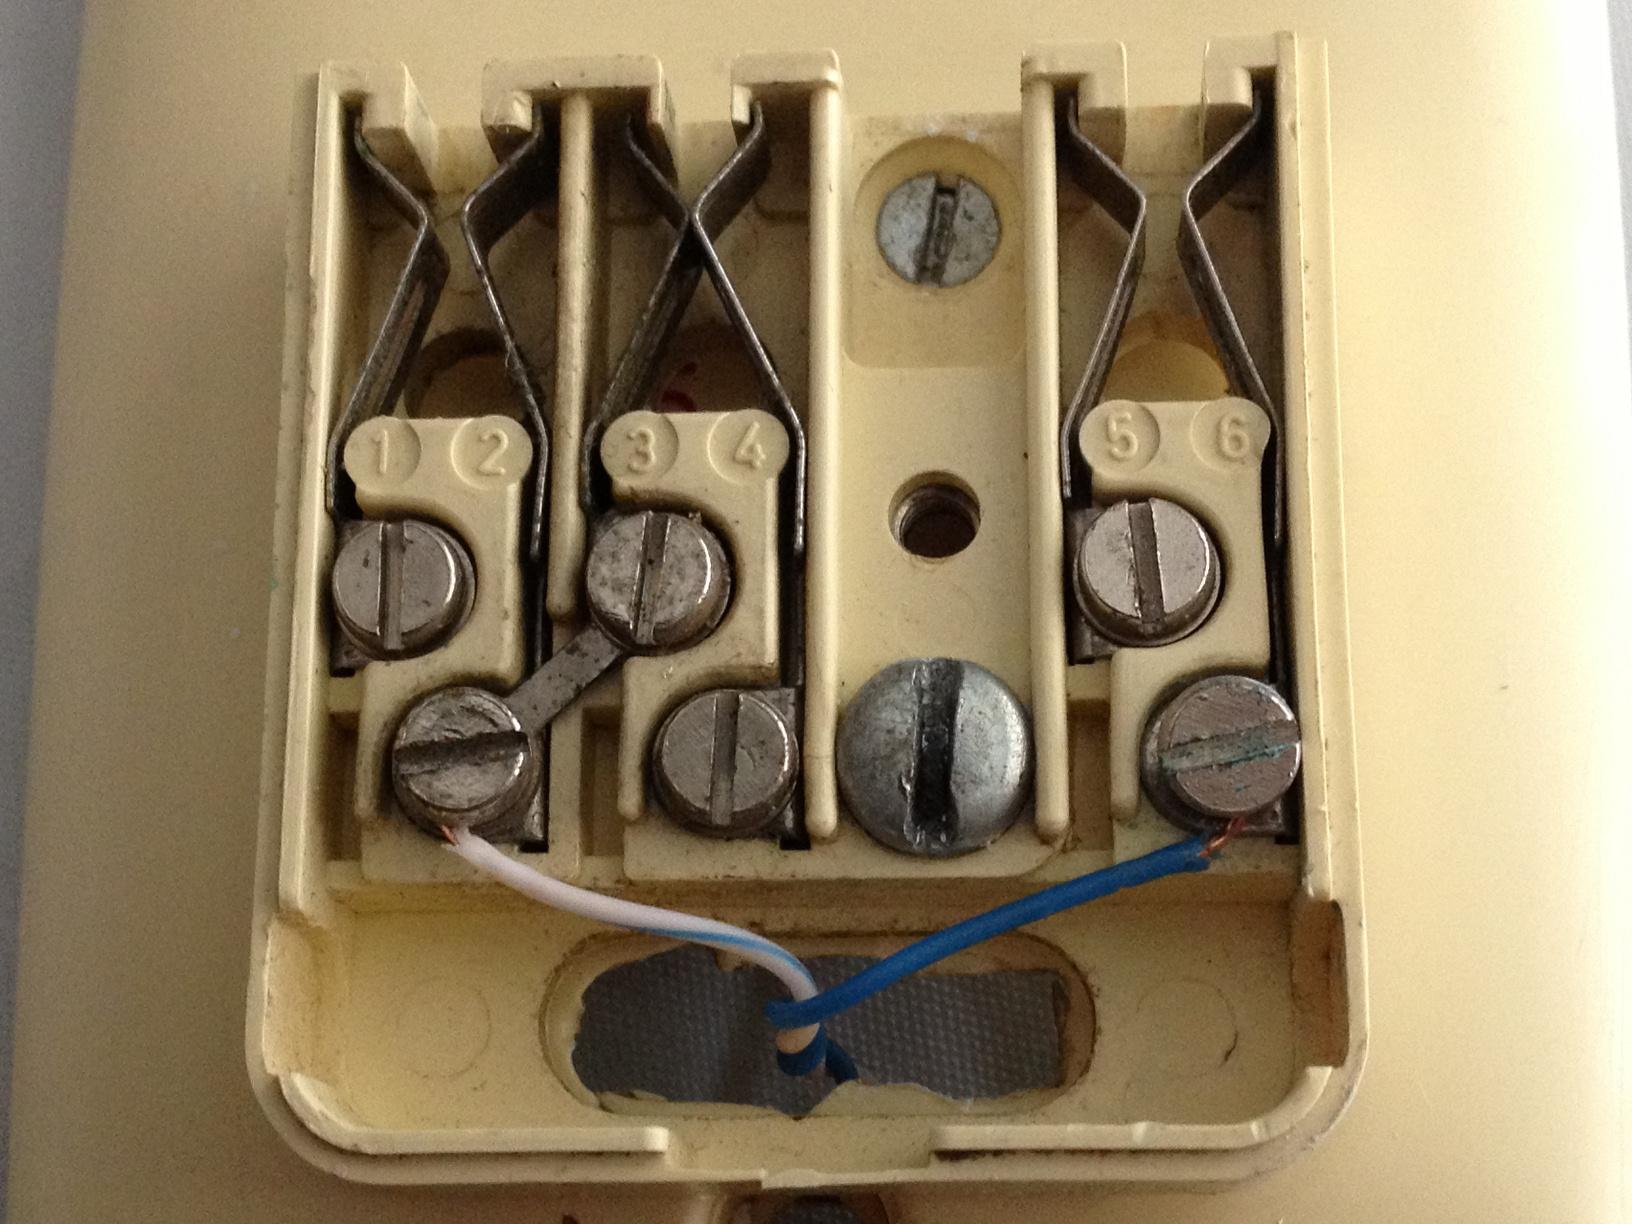 upgrading a 600 series phone socket to rj11 tp69 hpm telephone socket wiring australia for a [ 1632 x 1224 Pixel ]